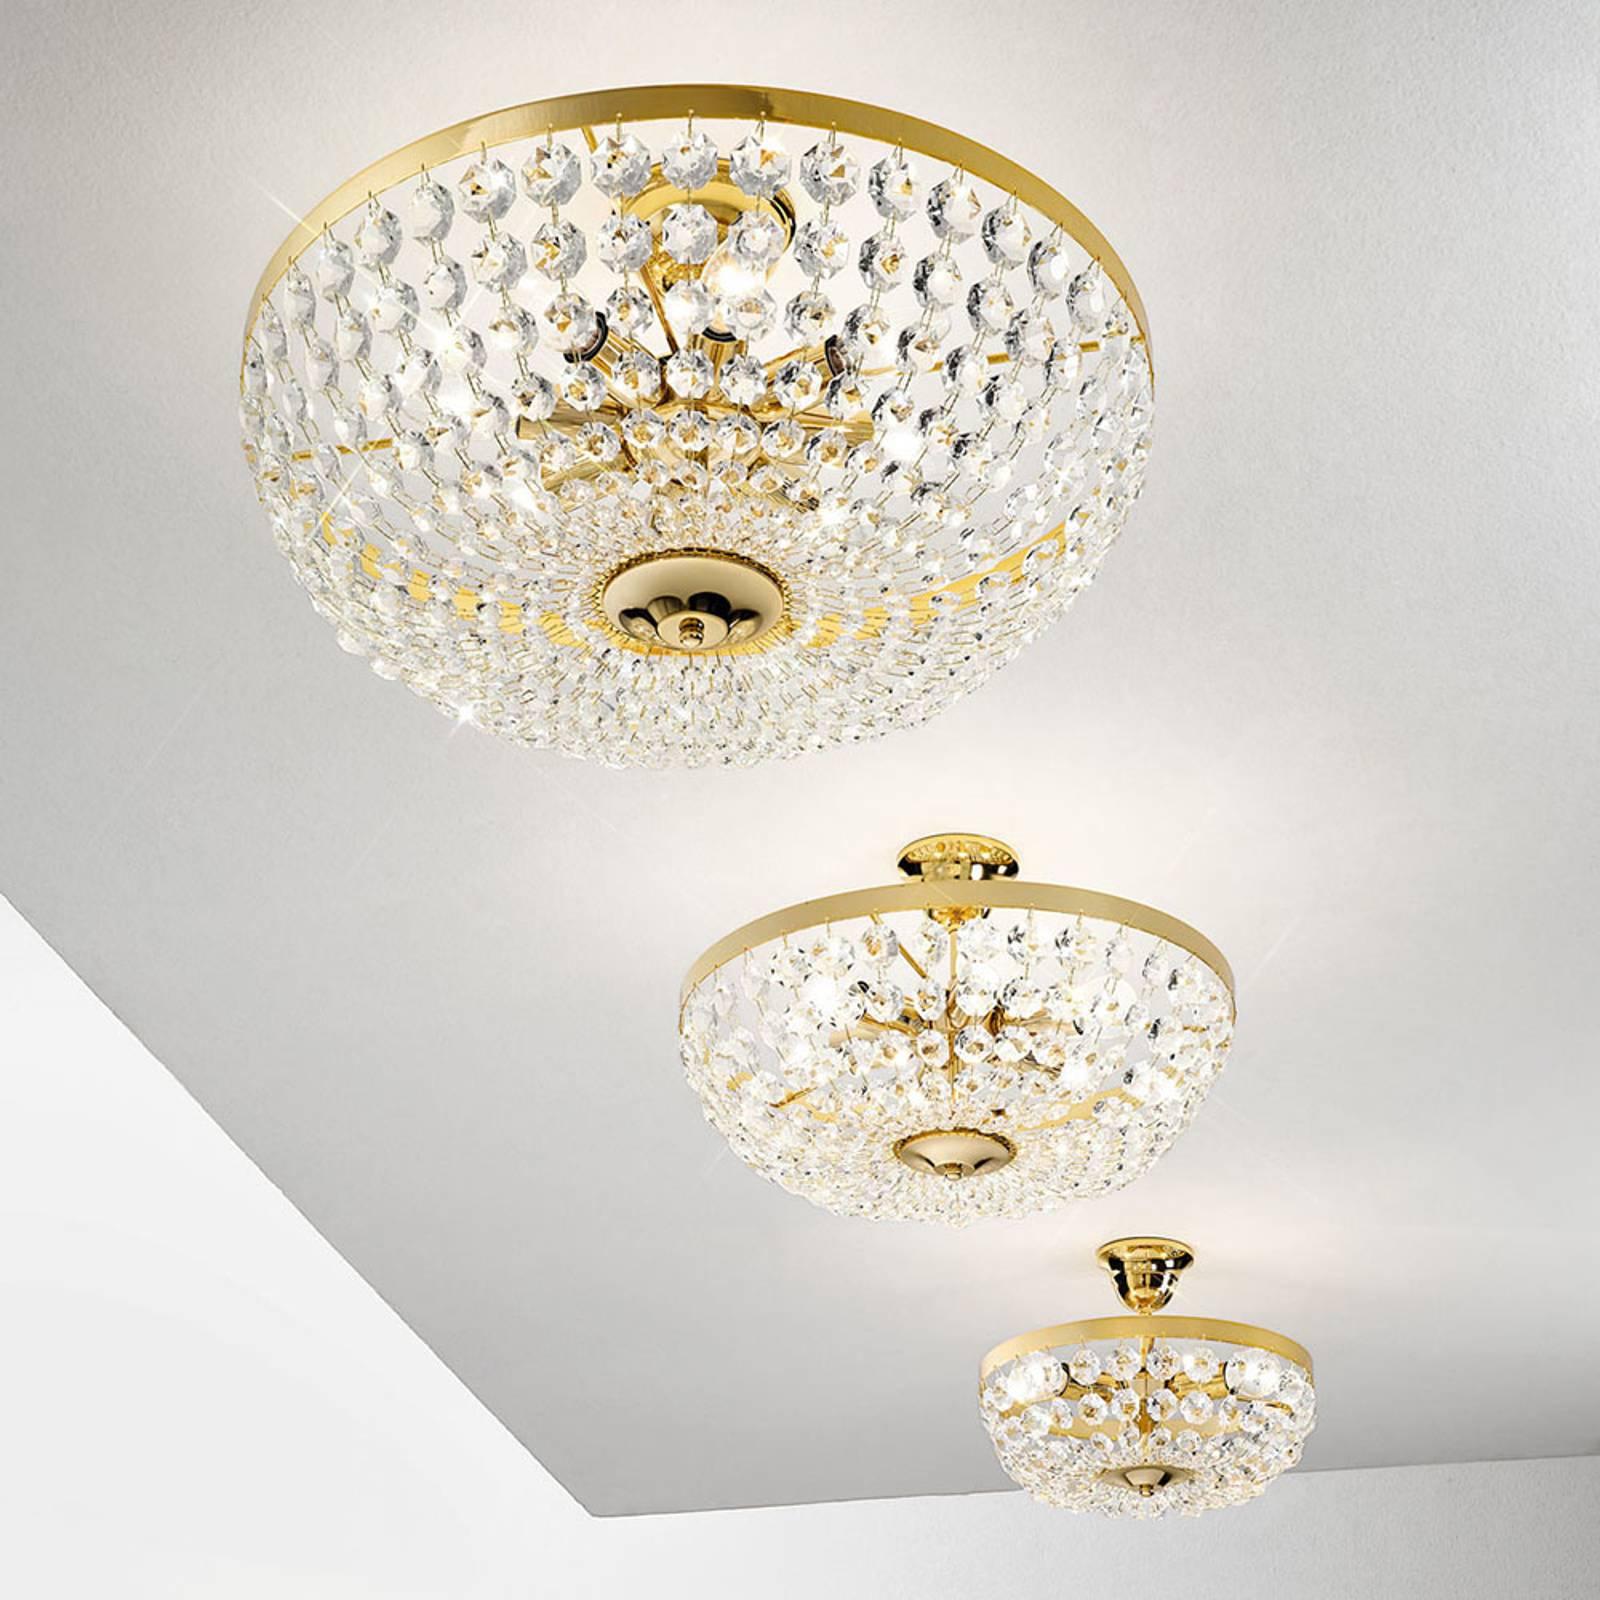 Plafondlamp Valerie, goud, Ø 50 cm